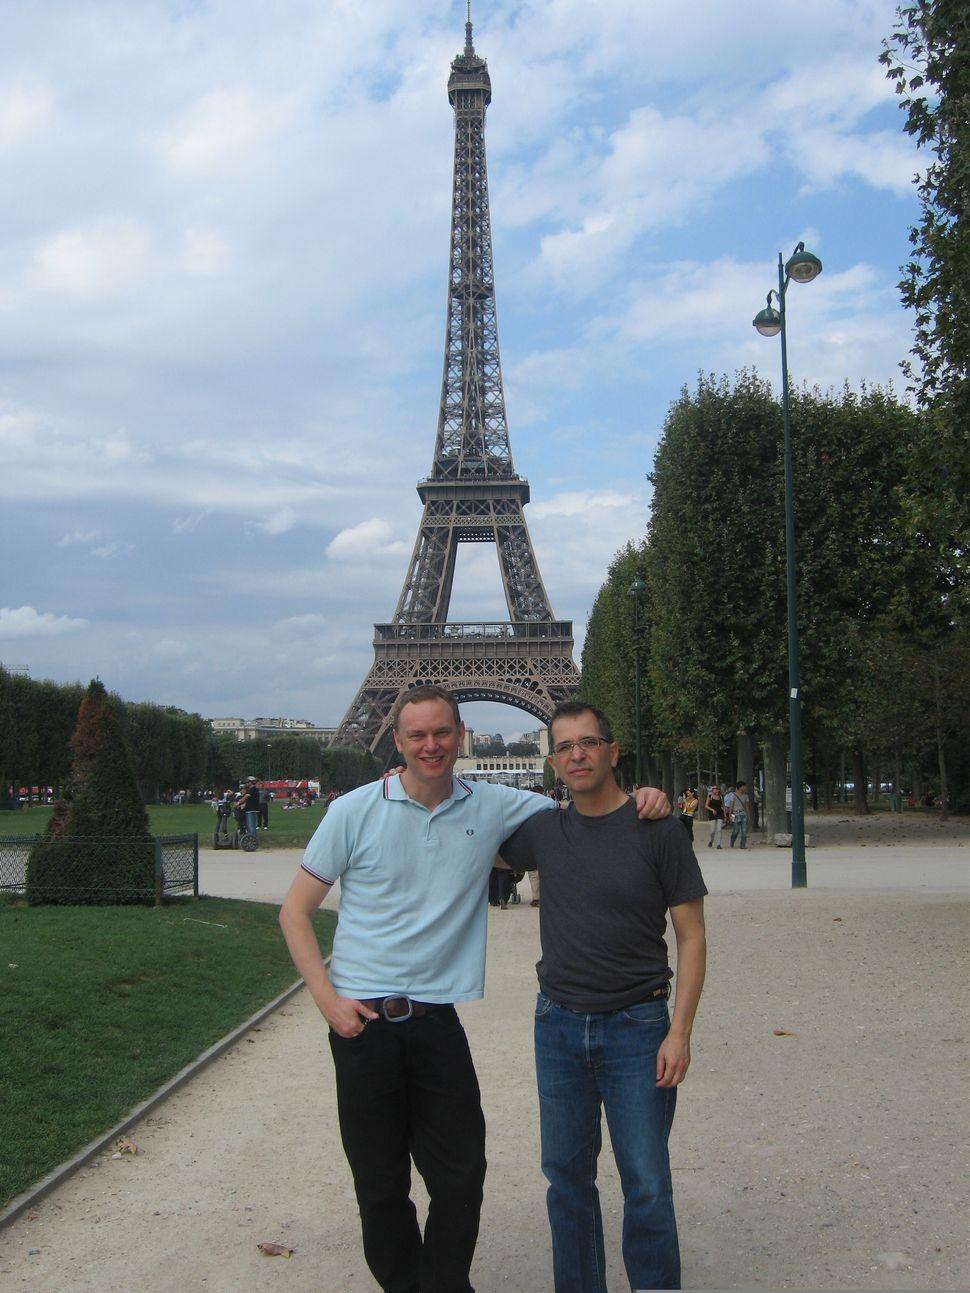 Wash Westmoreland (left) and Richard Glatzer in Paris.